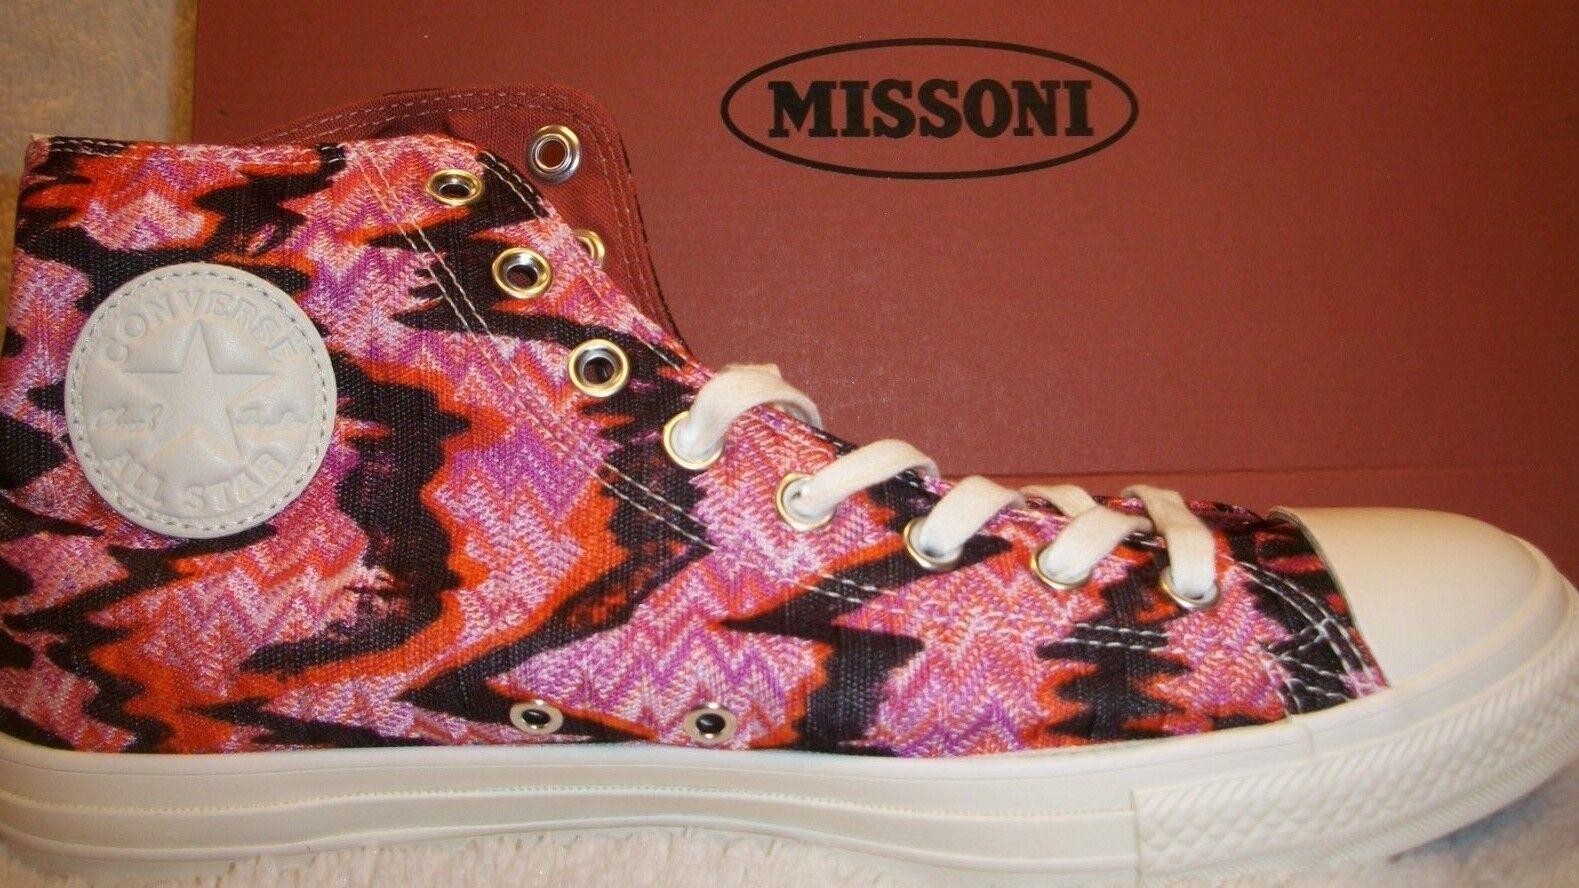 Converse 154441C CTAS Hi Missoni Pink Blk Men's 10 -Women's 12 Mfg Ret  150